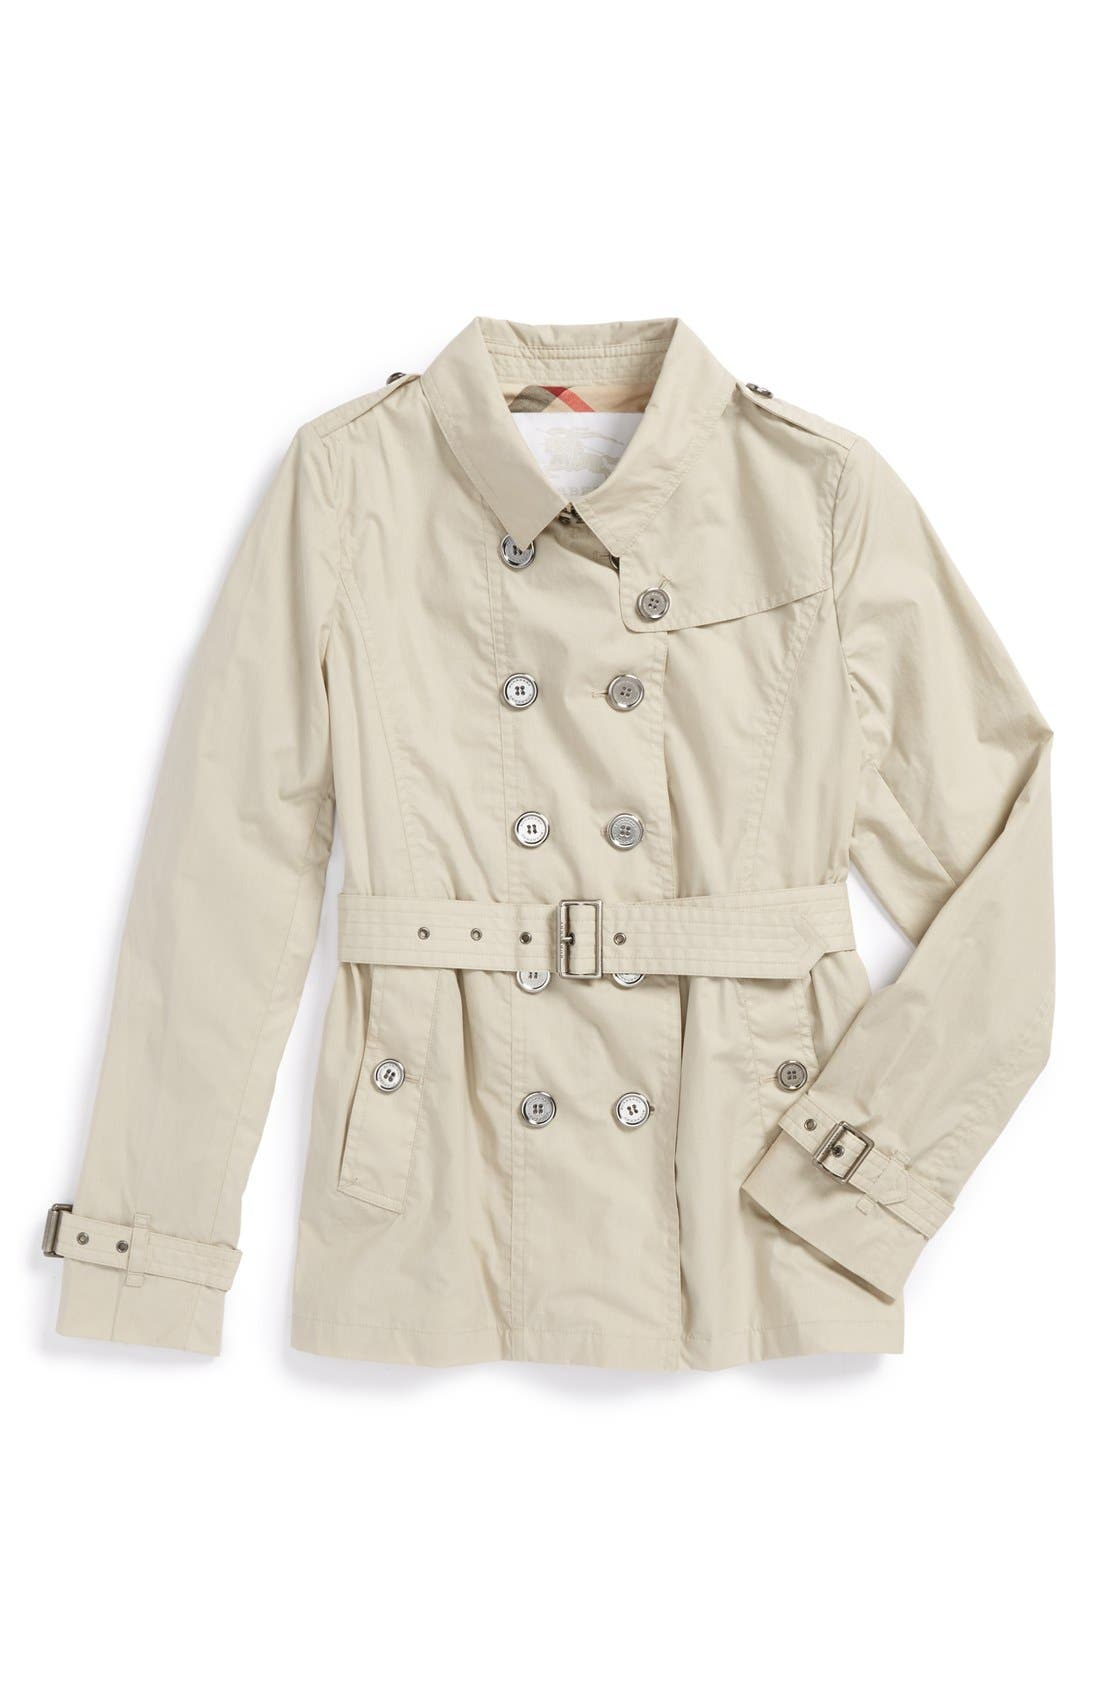 Alternate Image 1 Selected - Burberry Trench Coat (Little Girls & Big Girls)